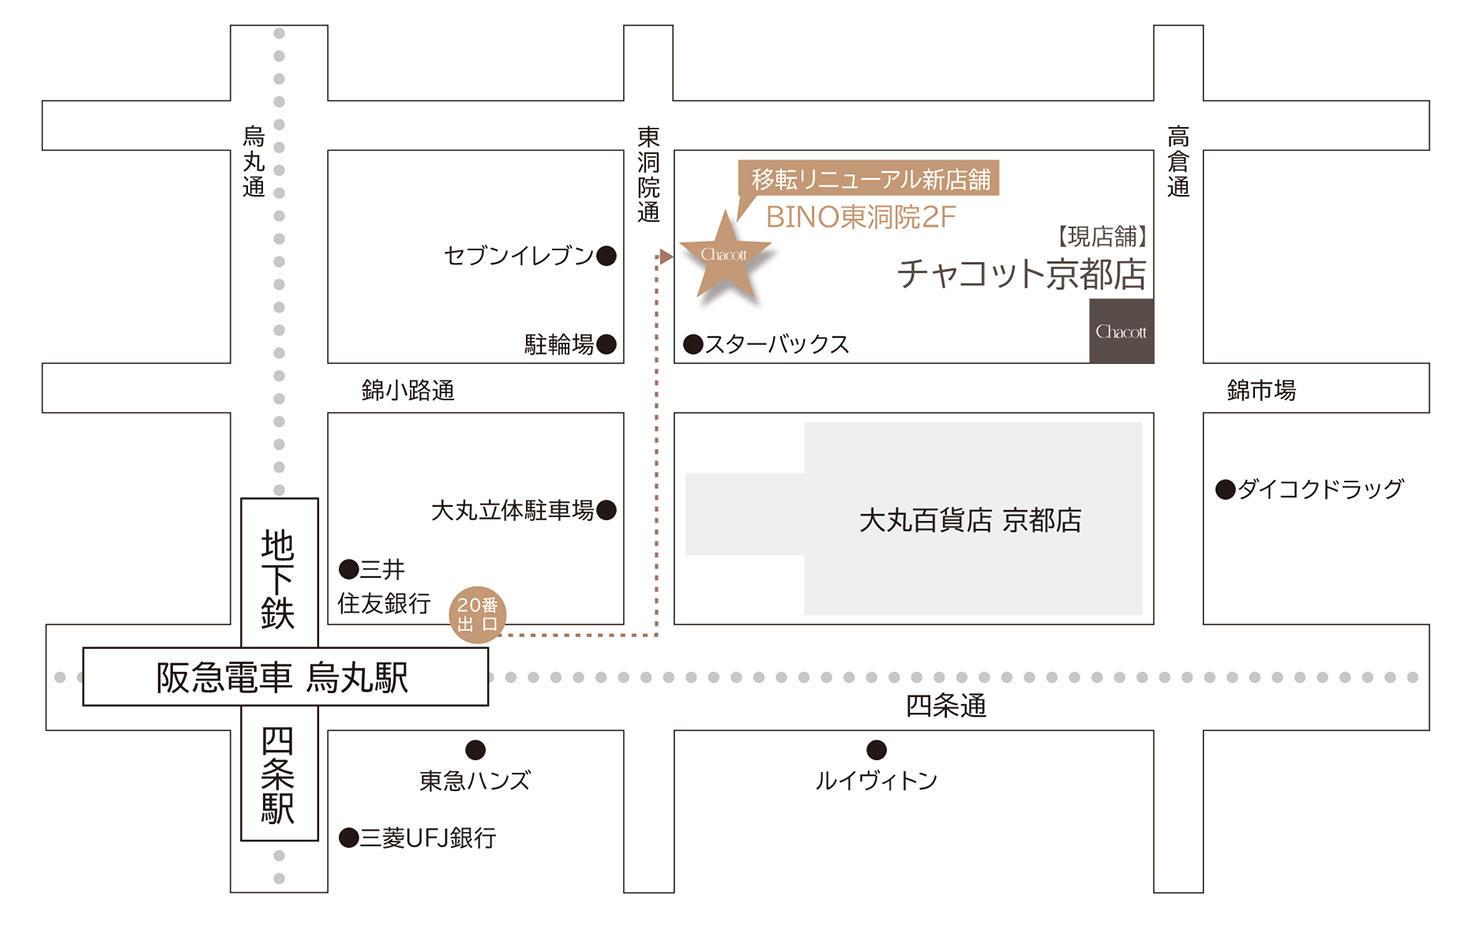 kyoto_iten_map201903.jpg